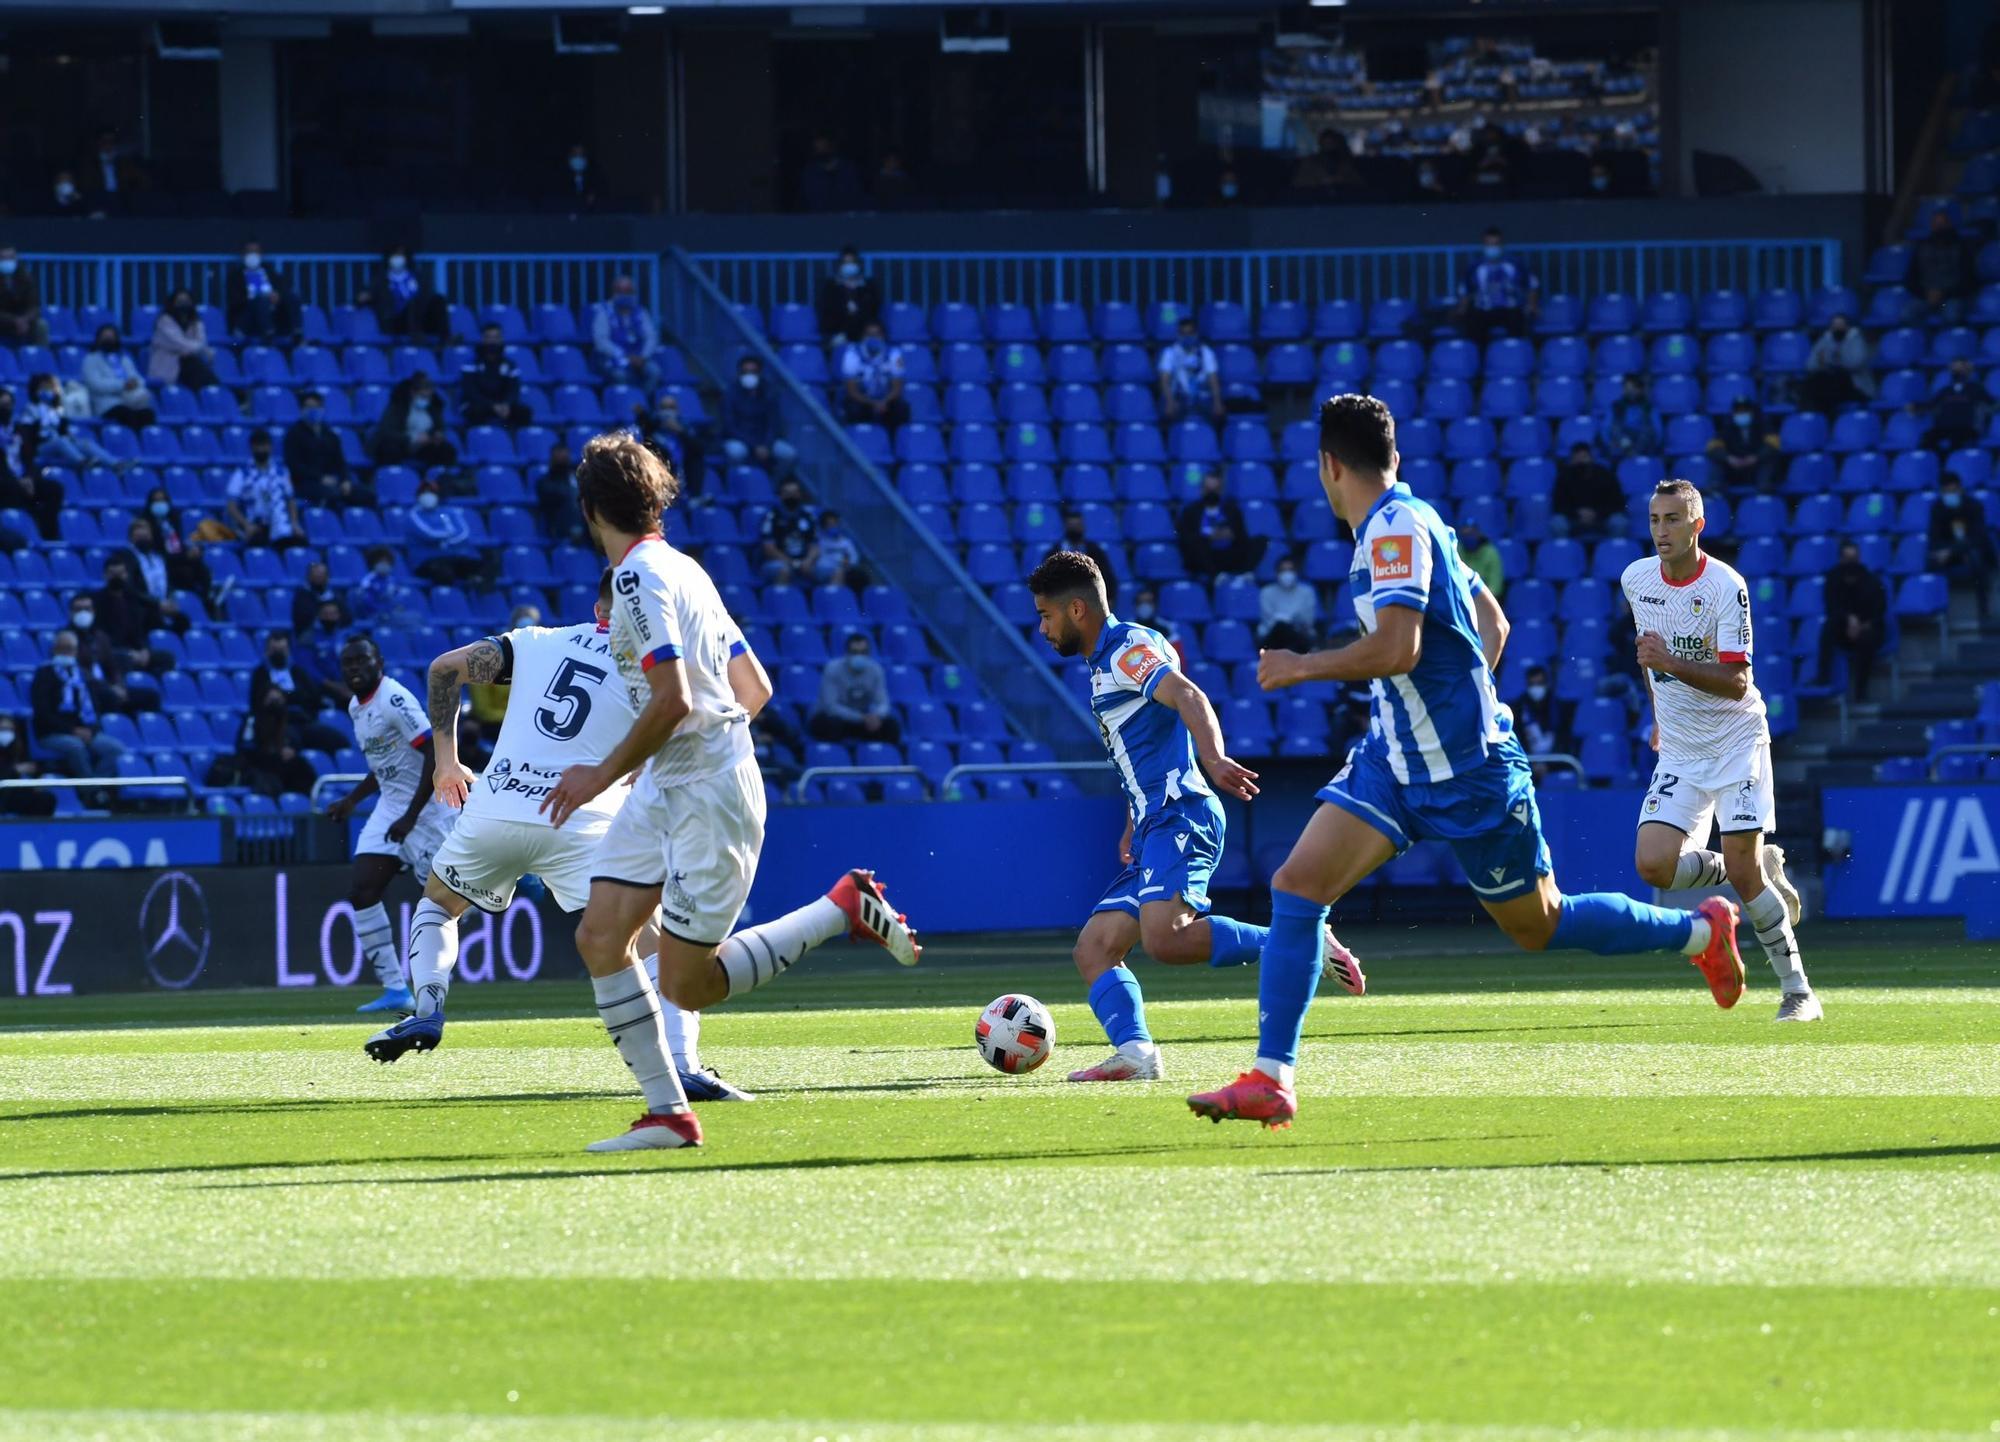 Deportivo 5 - 0 Langreo